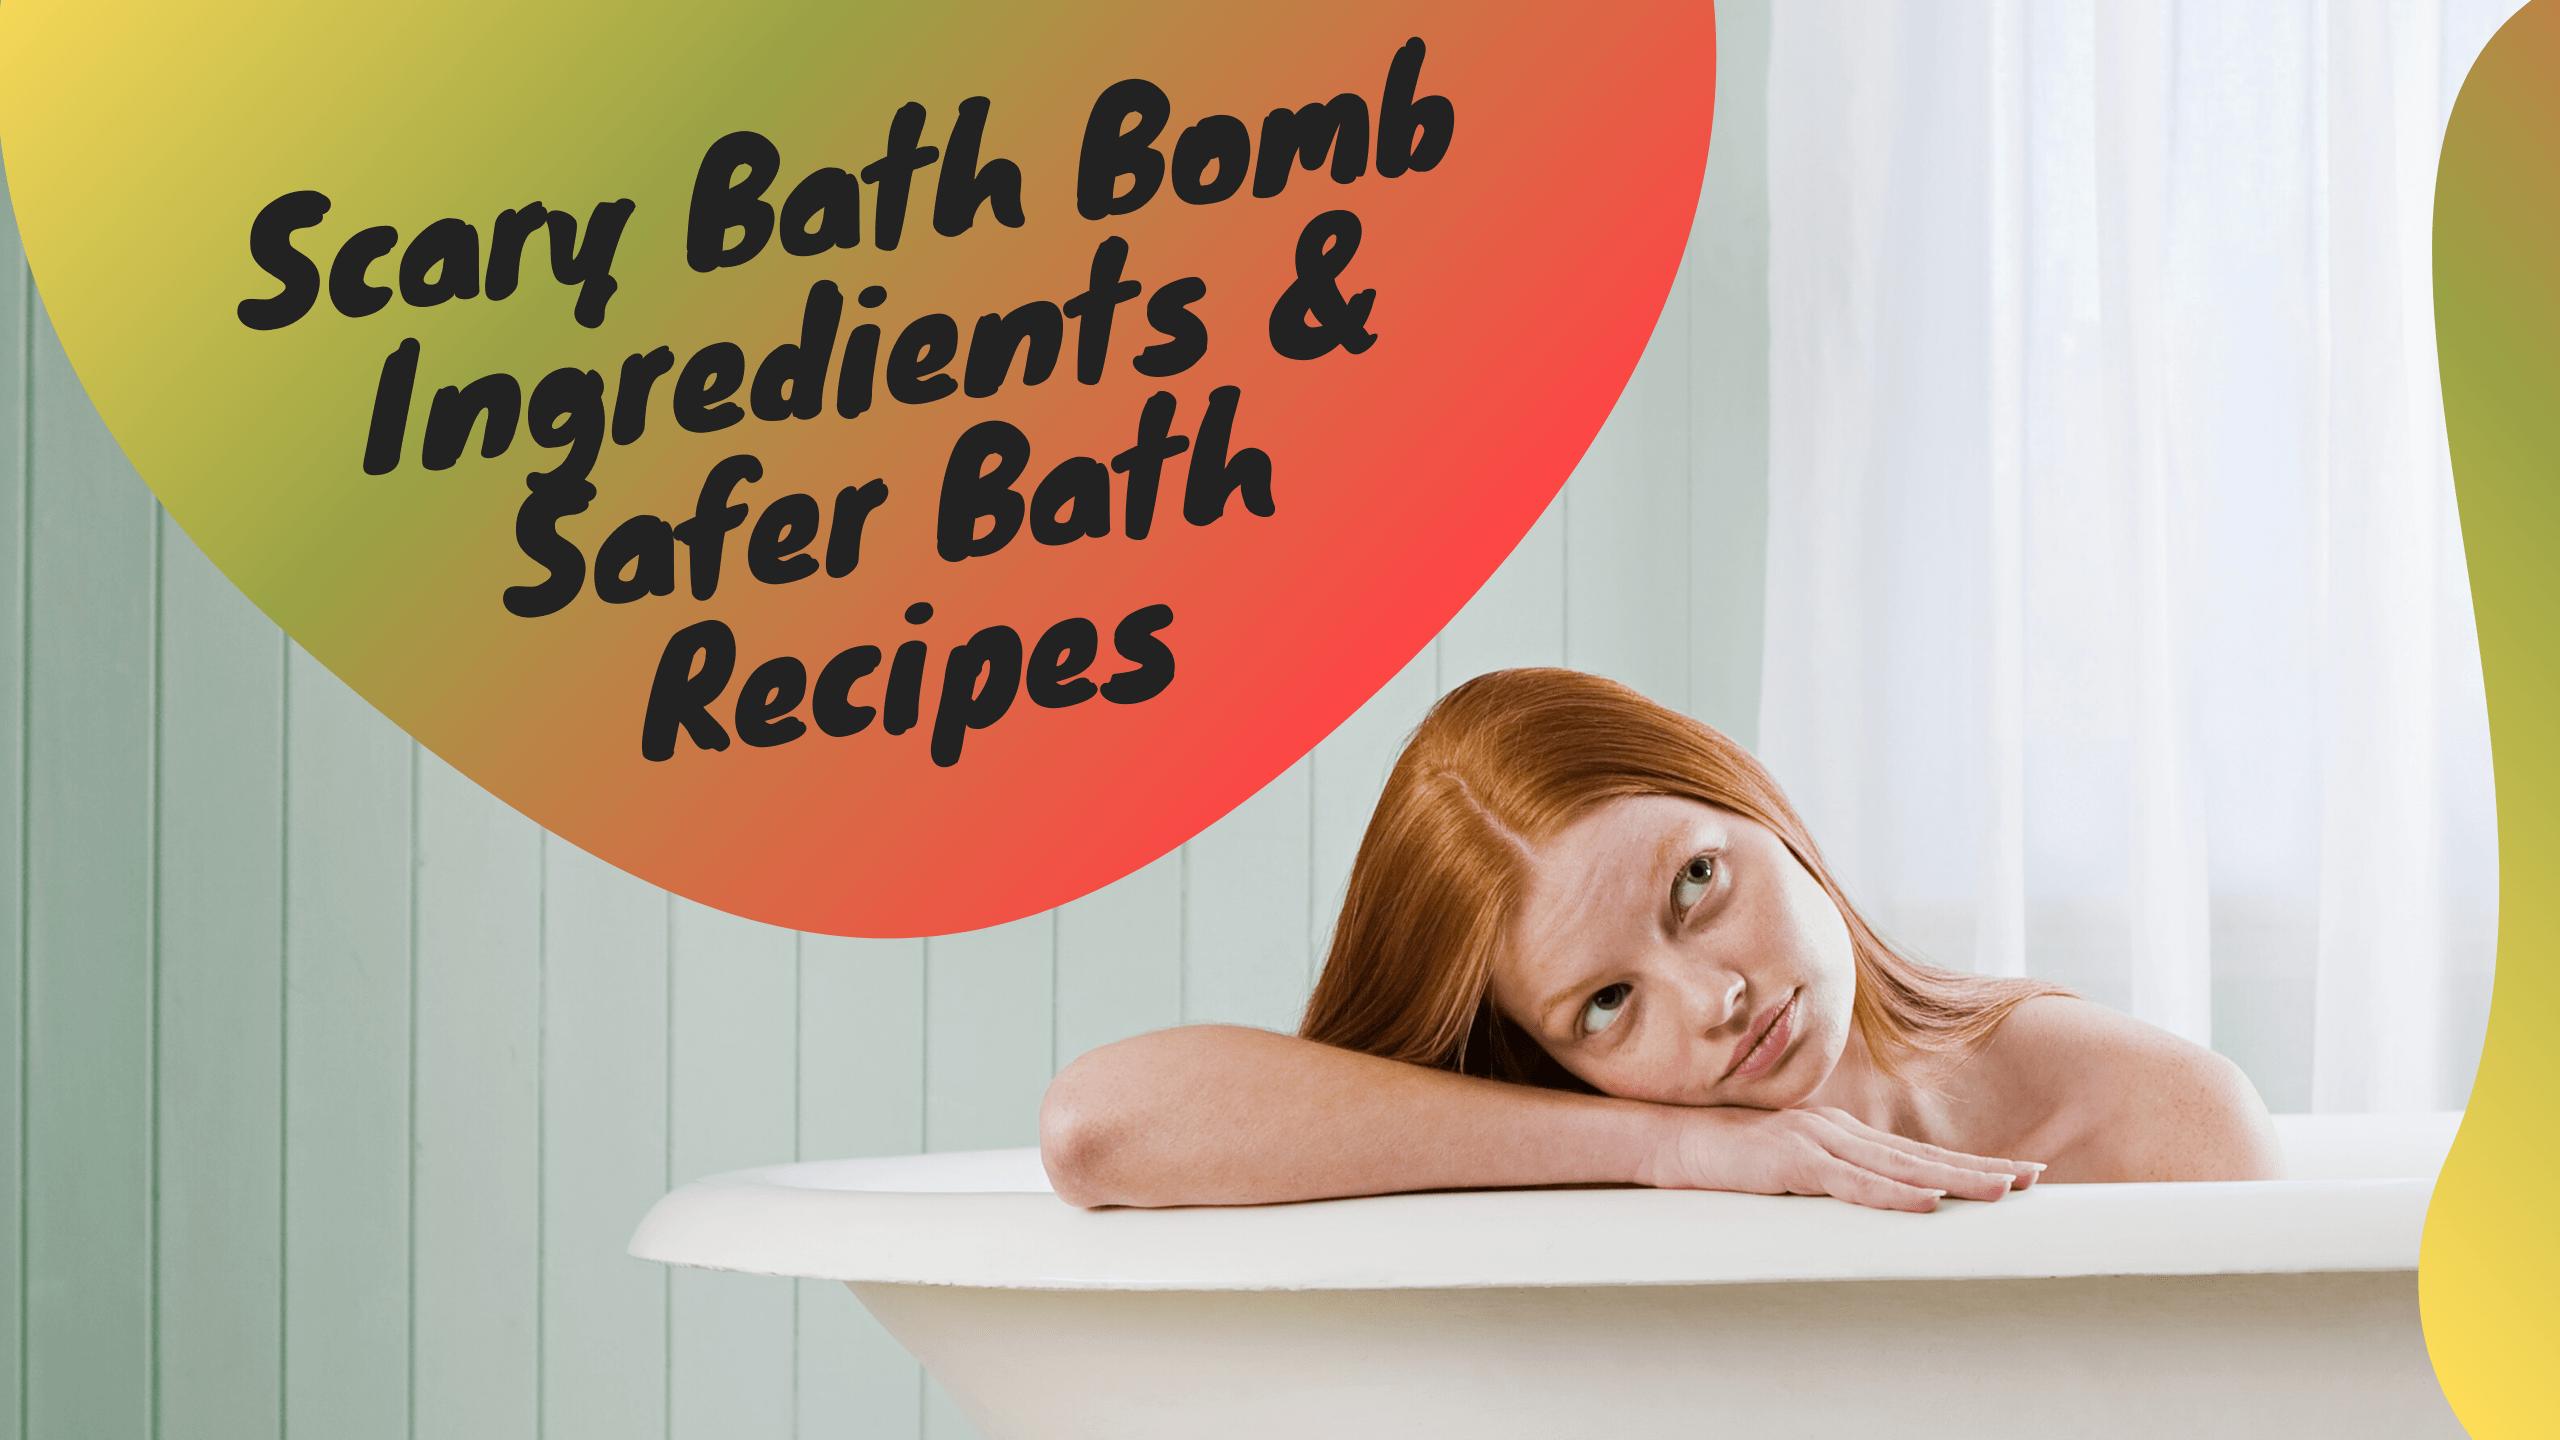 Scary Bath Bomb Ingredients & Safer Bath Recipes